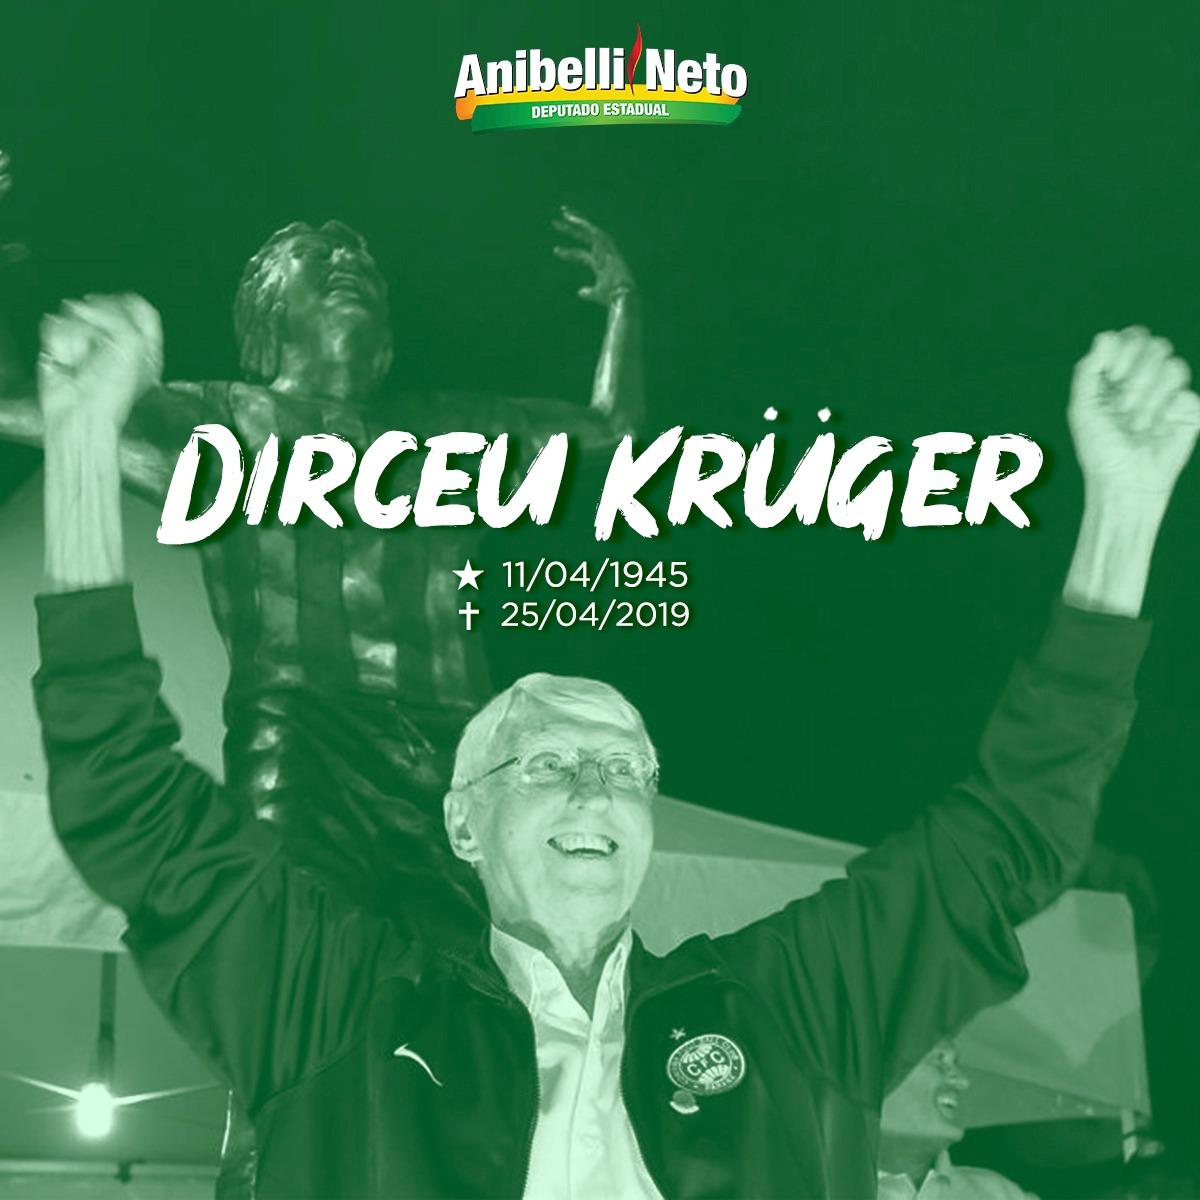 Anibelli Neto lamenta o falecimento de Krüger.